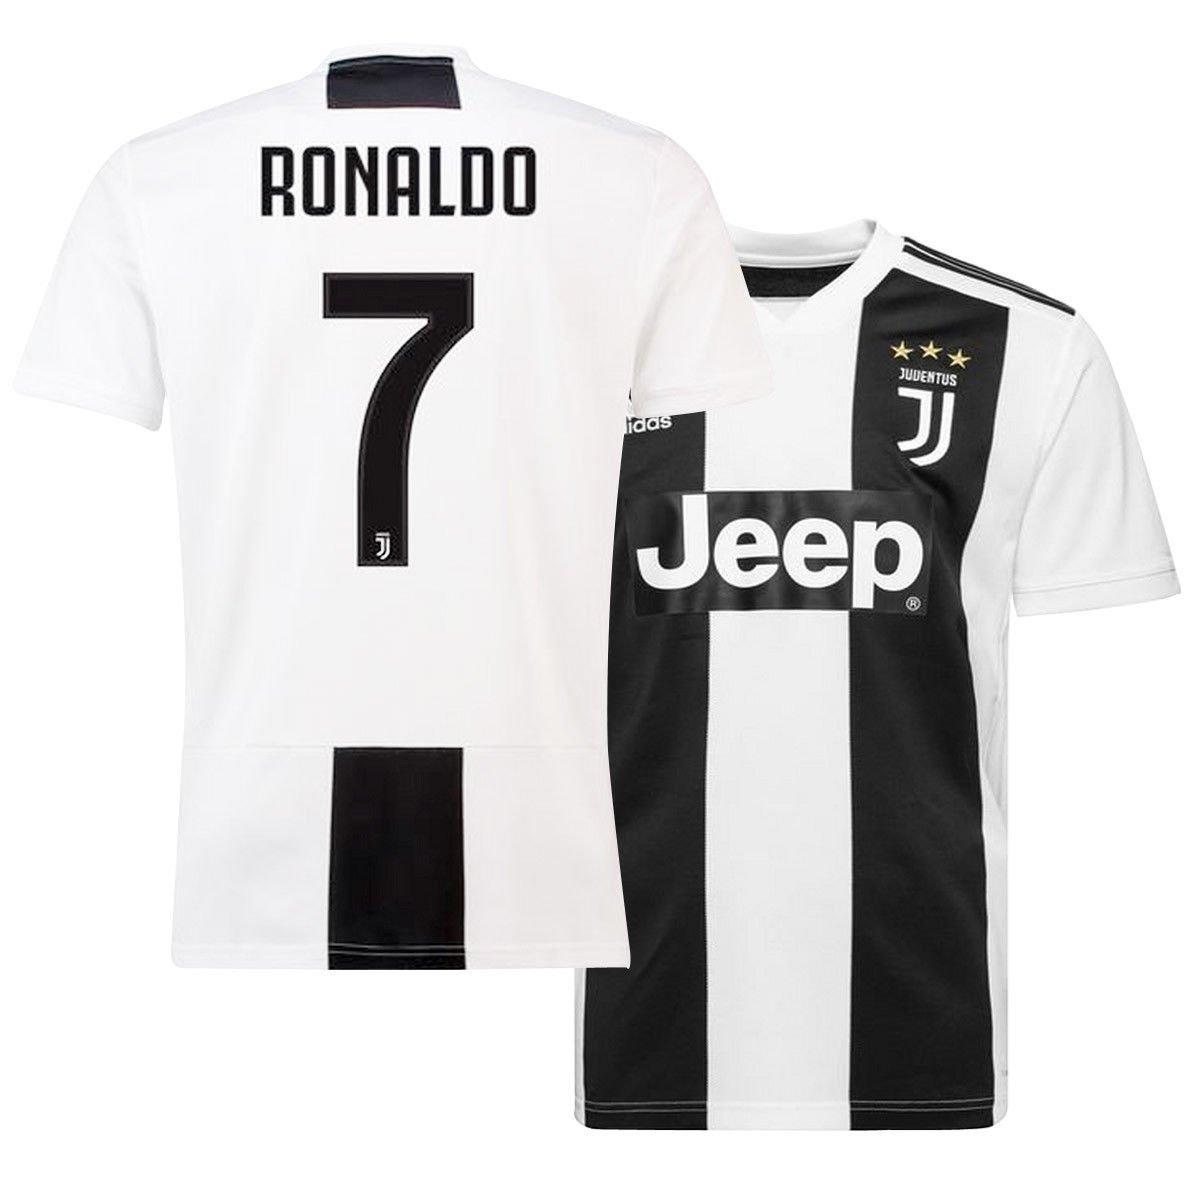 new products 3e4a4 ff47e ukgiftshop 2018/19 Ronaldo 7 Juventus Home Football Club ...